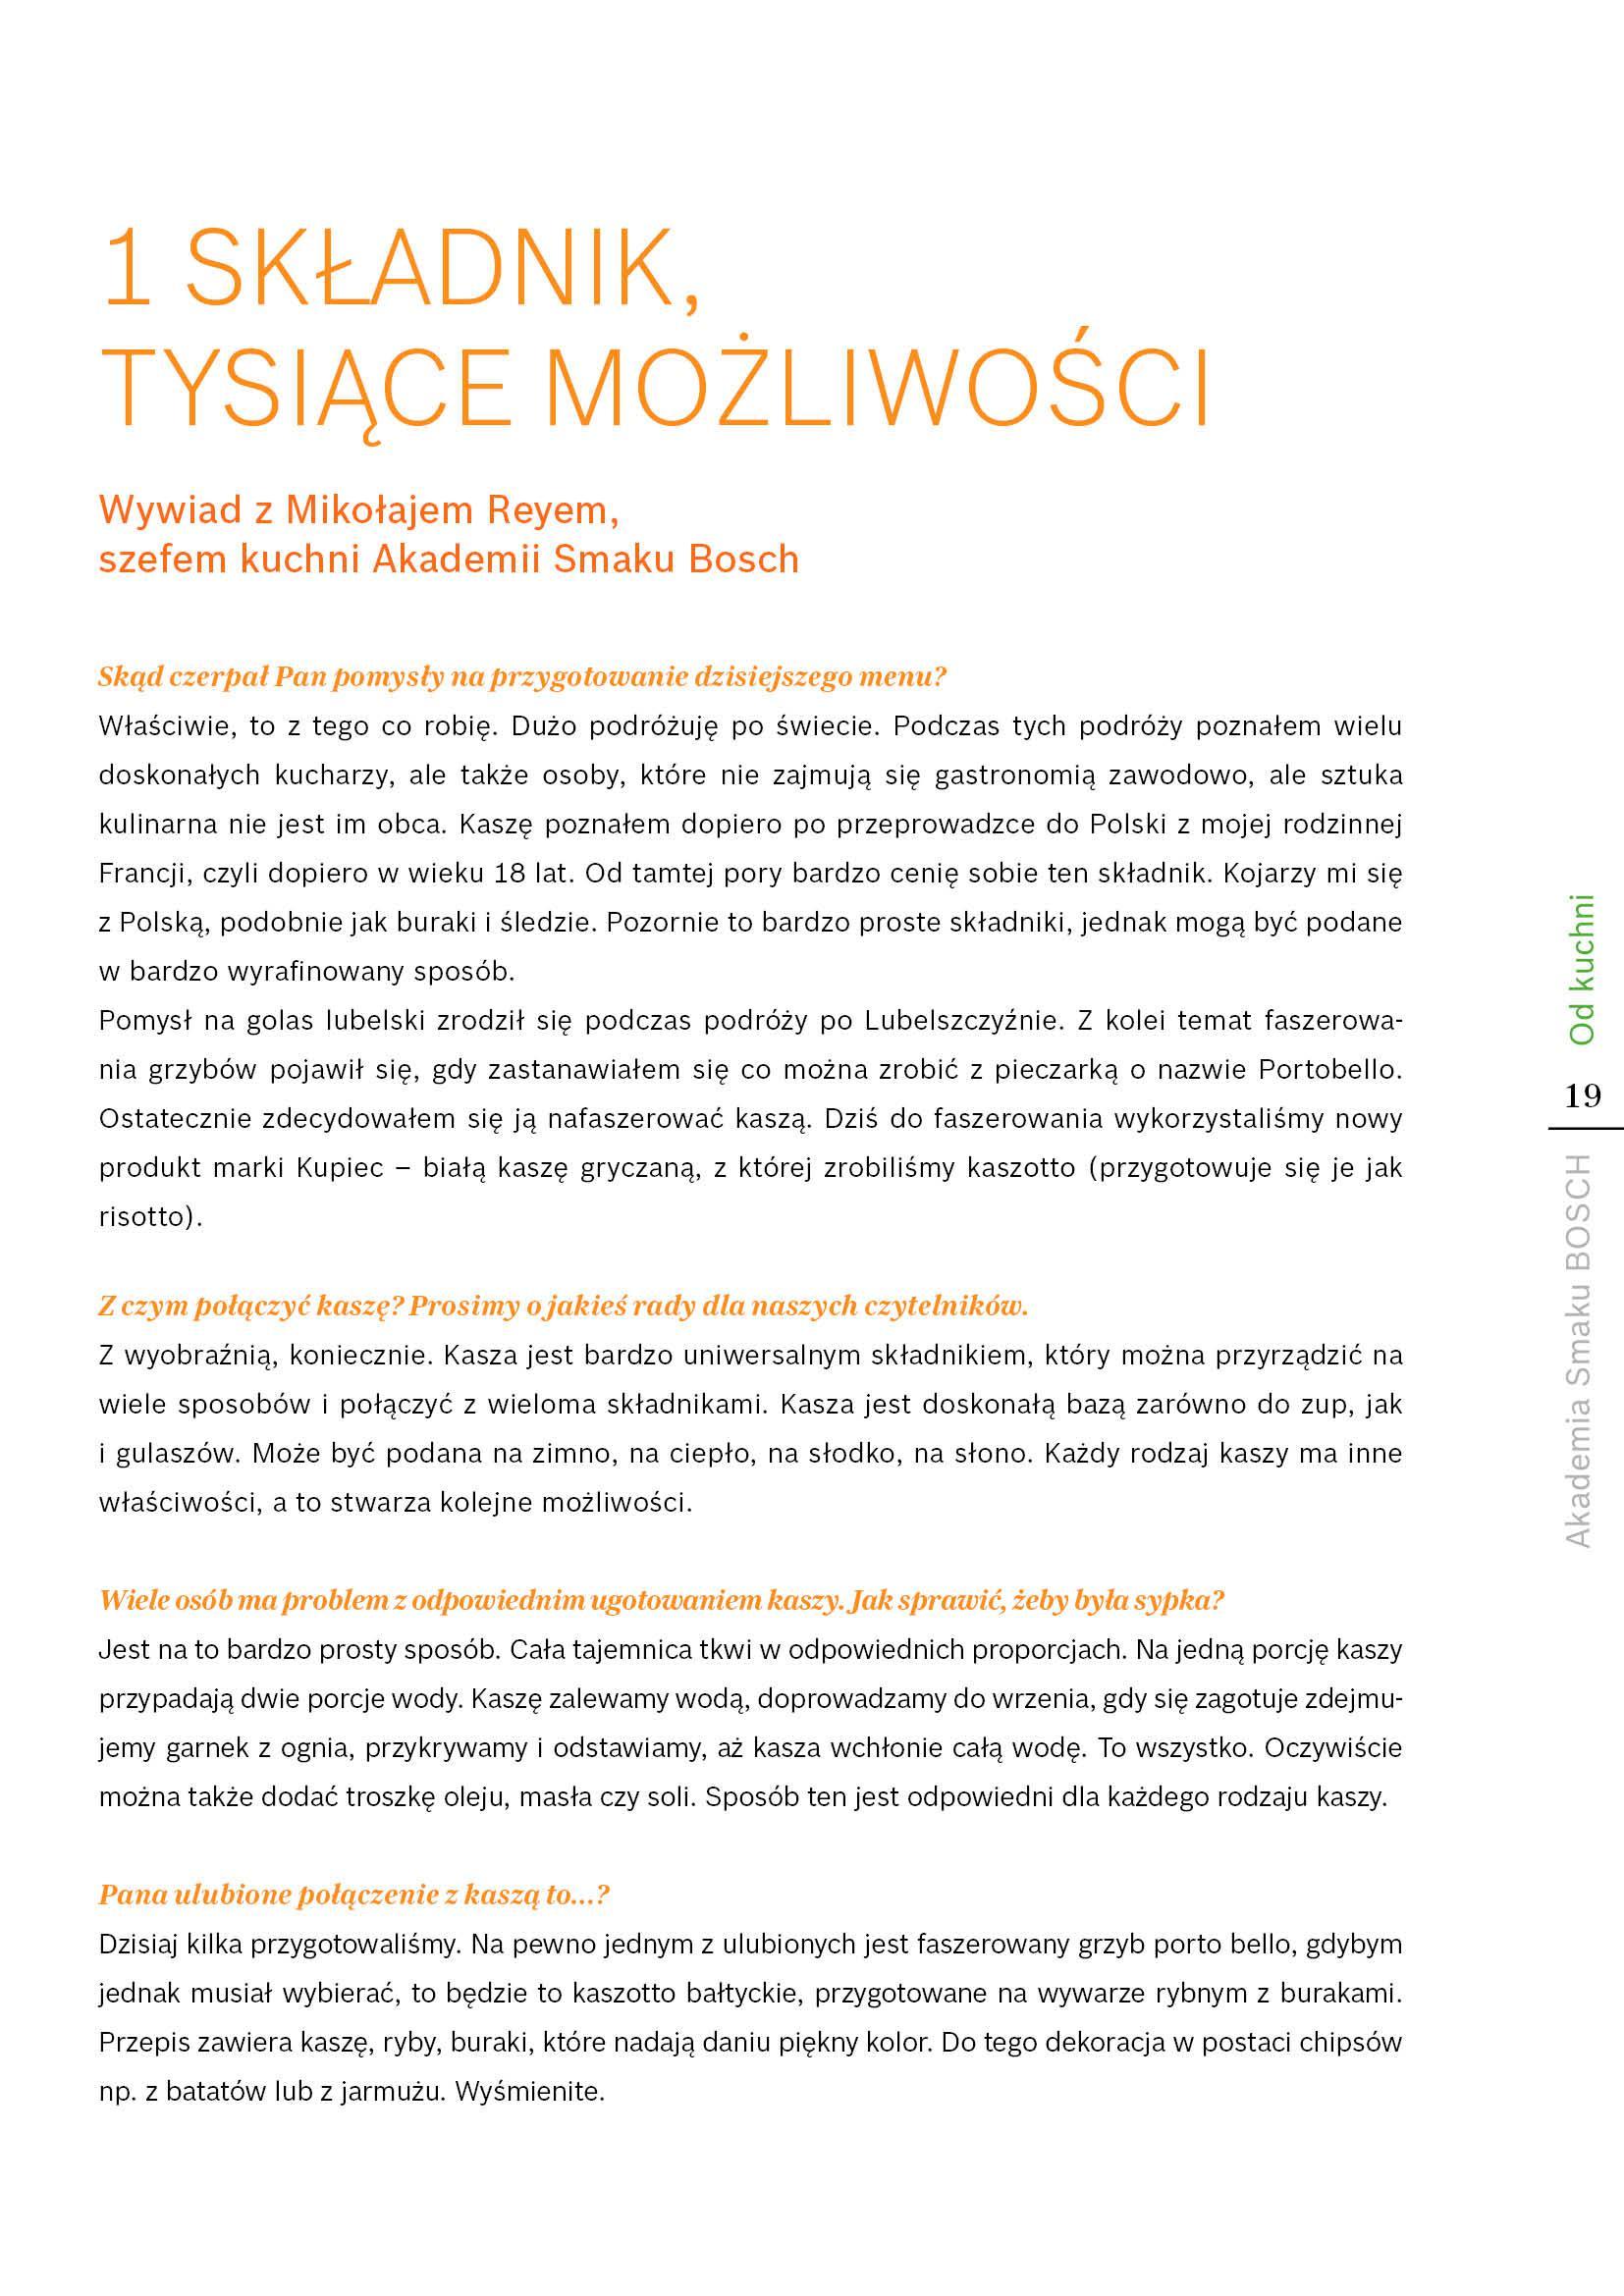 Nasza Kasza - Strona 19